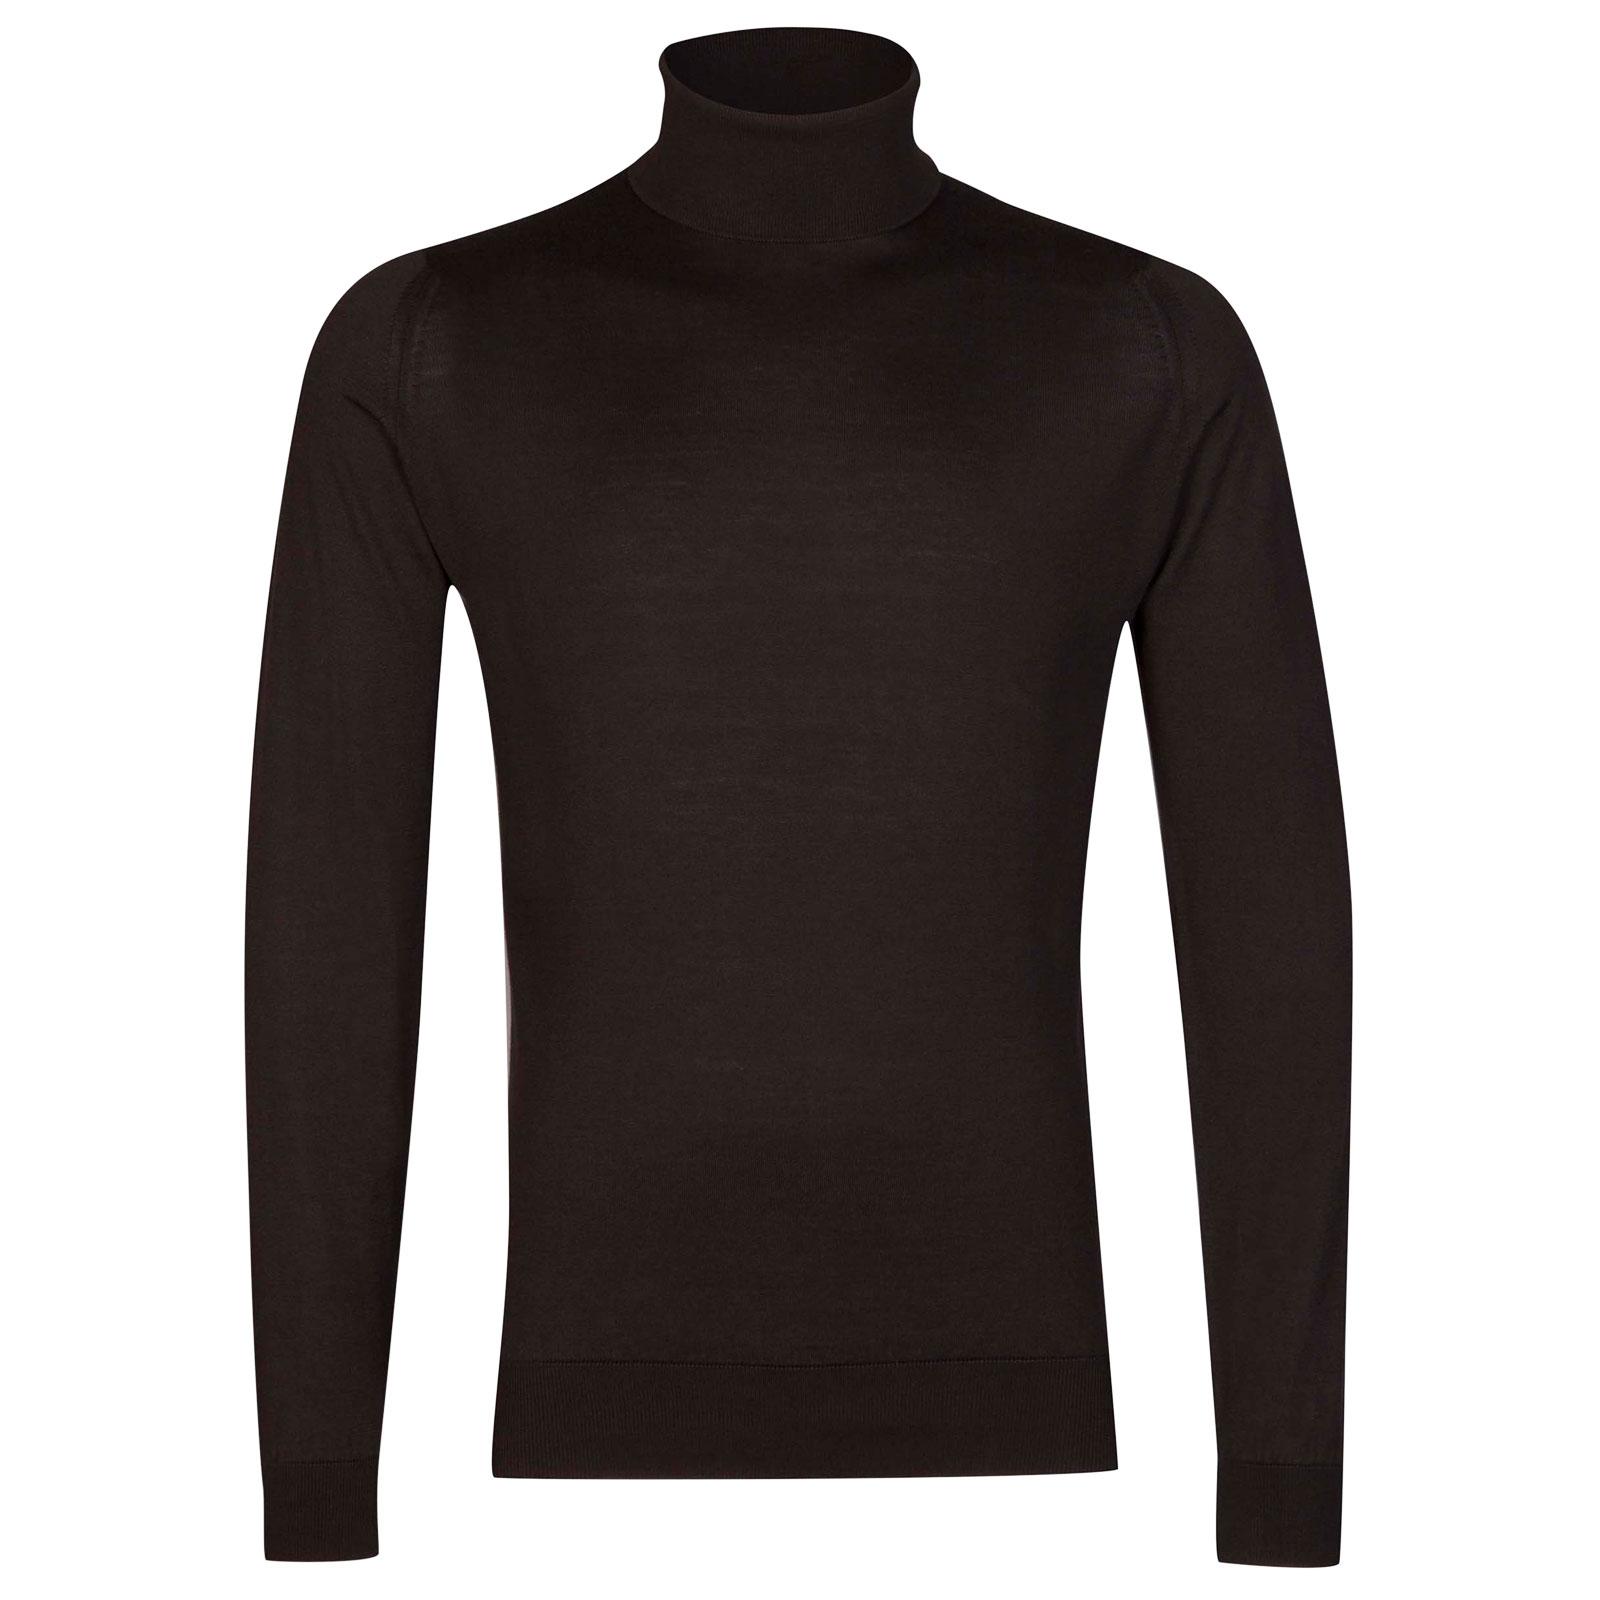 John Smedley Hawley in Dark Leather Pullover-SML